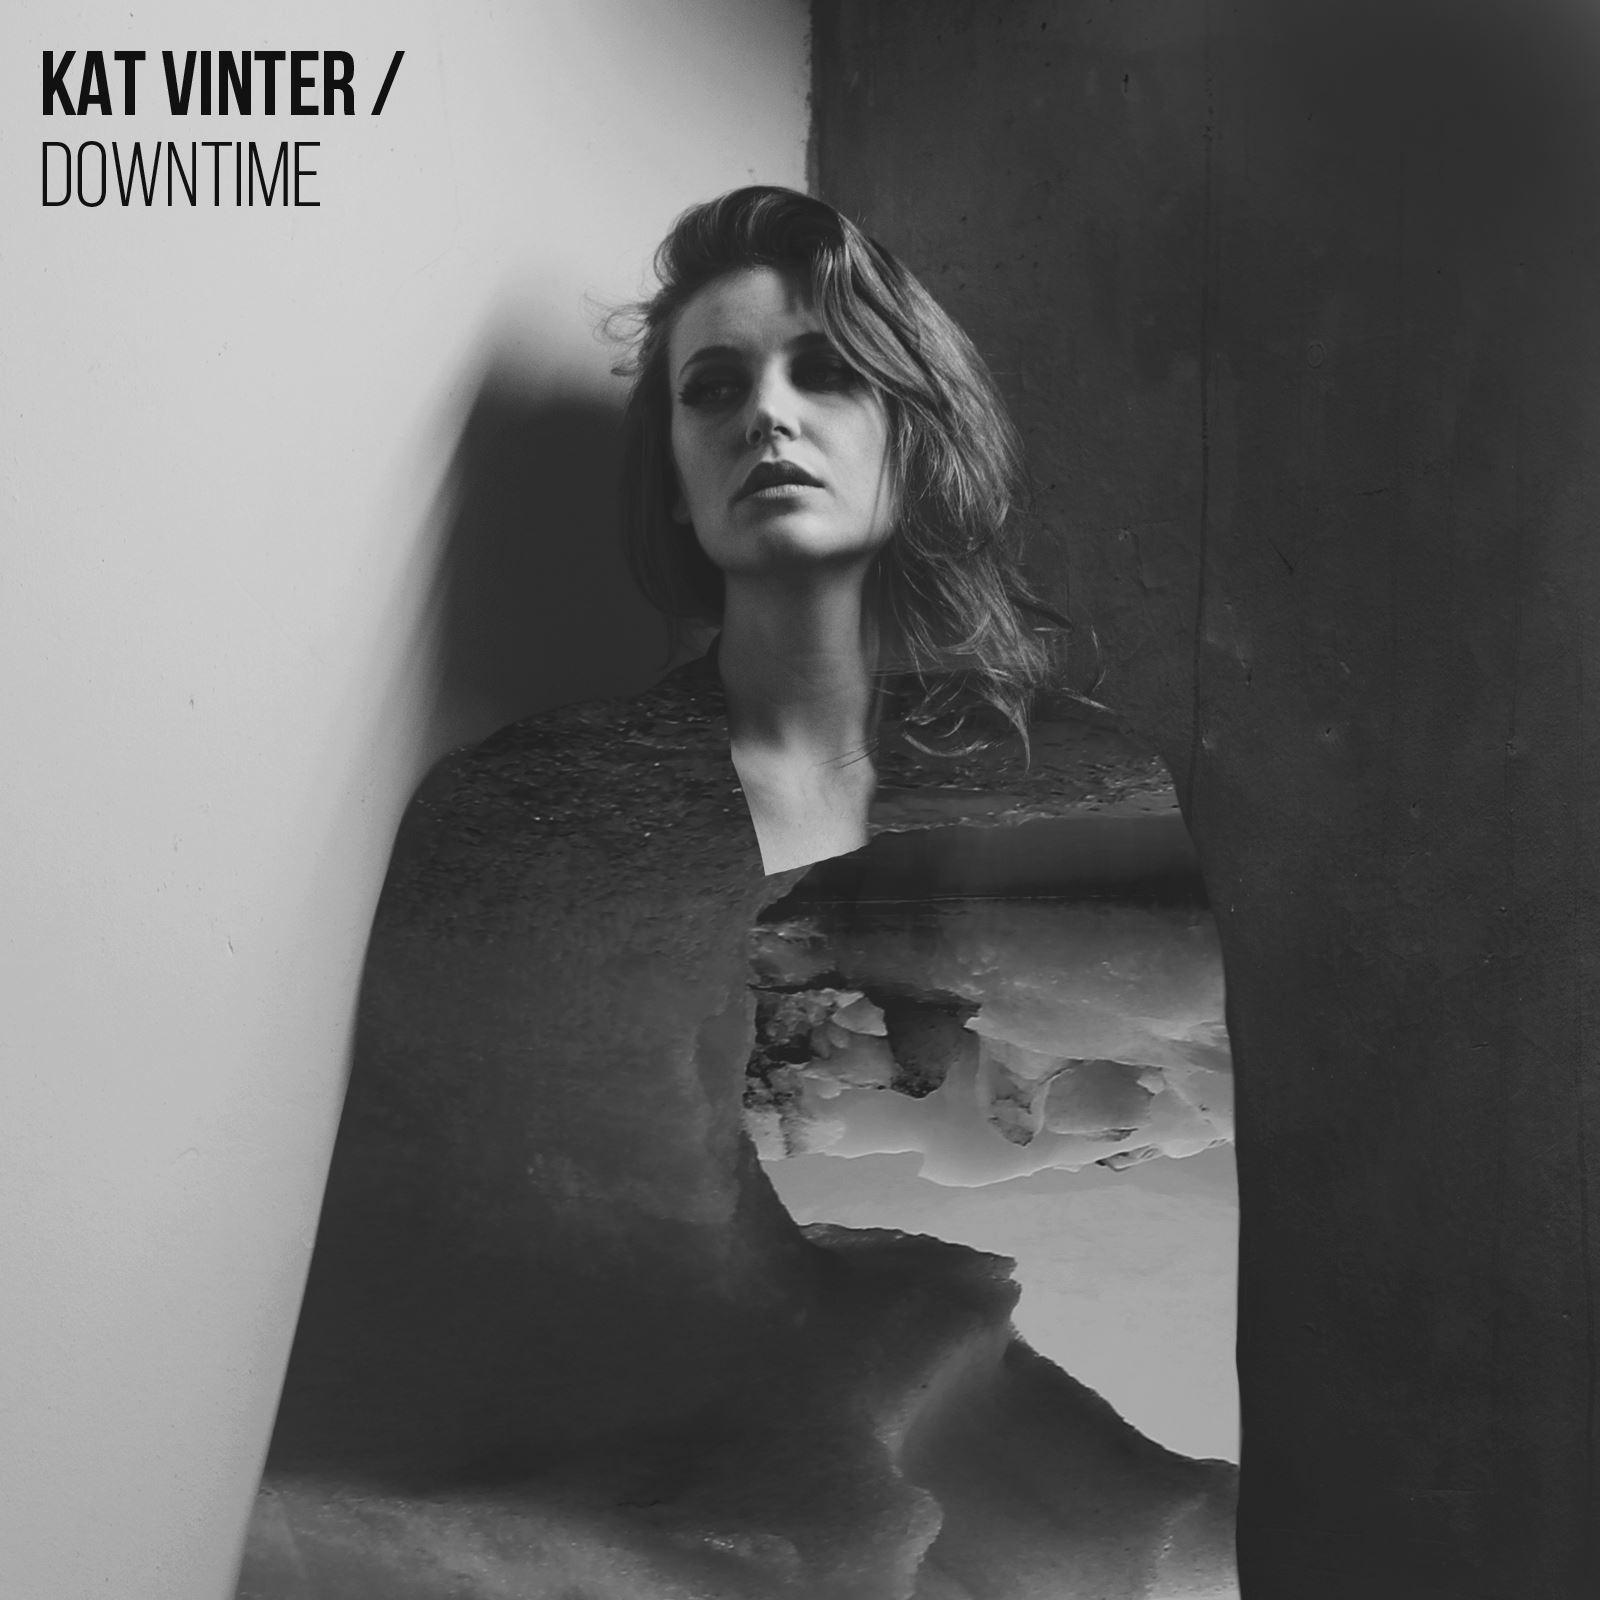 katvinter-downtime-single-cover